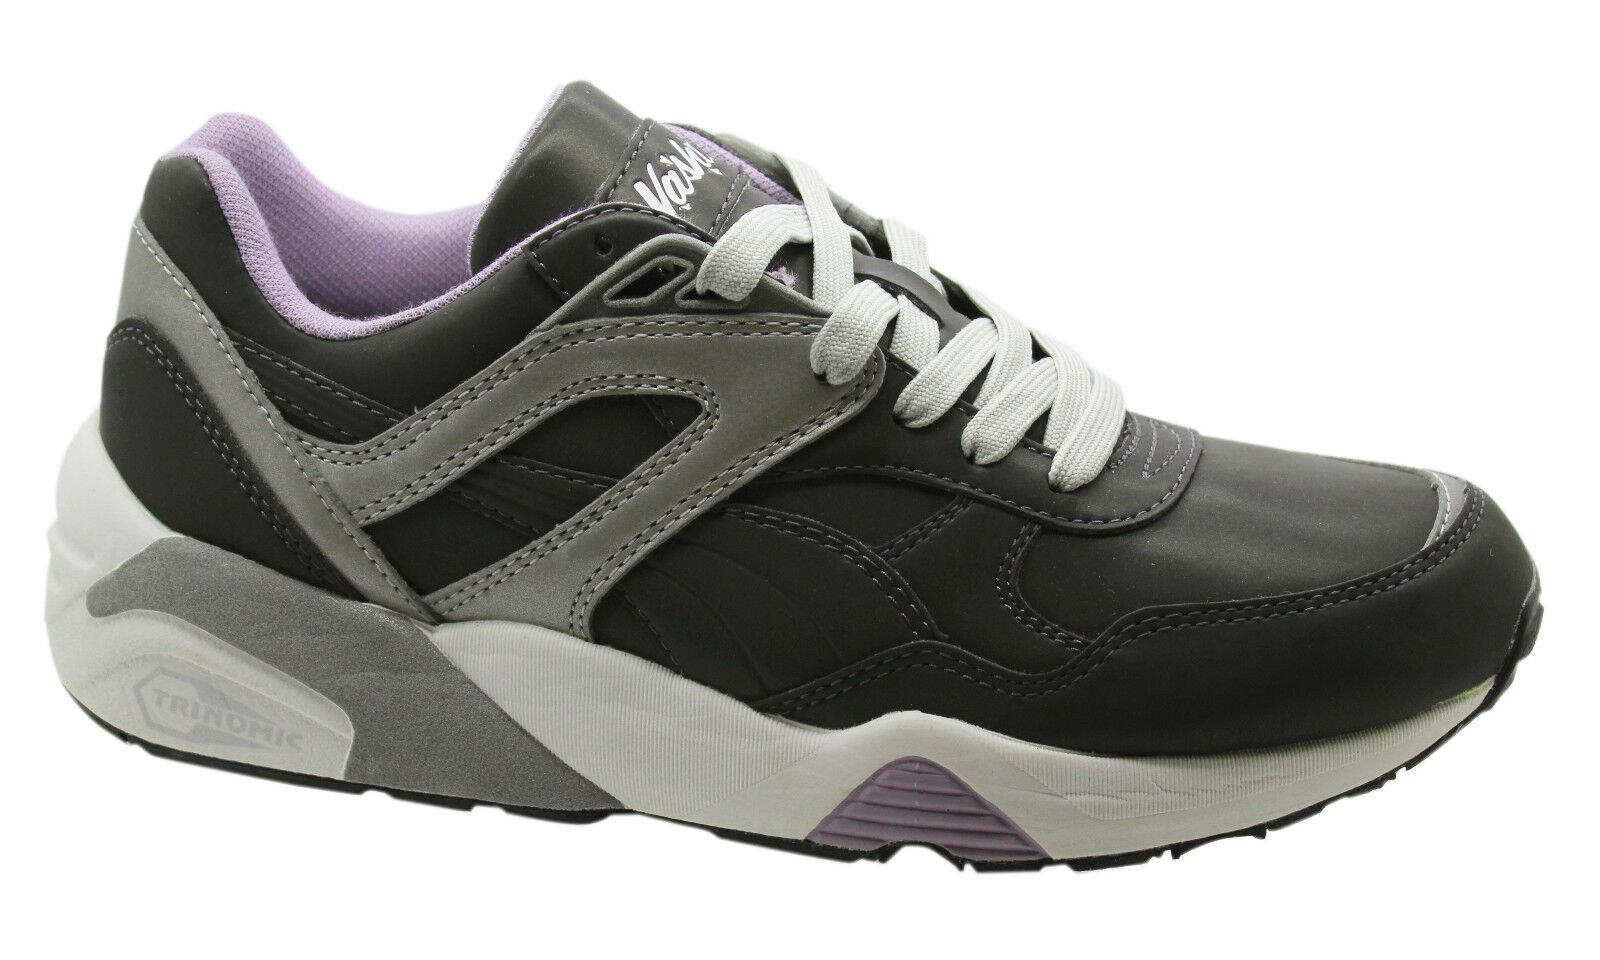 Puma Trinomic R698 x vashtie 90s 3m Zapatillas de mujer Zapatos Con Cordones Cheap women's shoes women's shoes